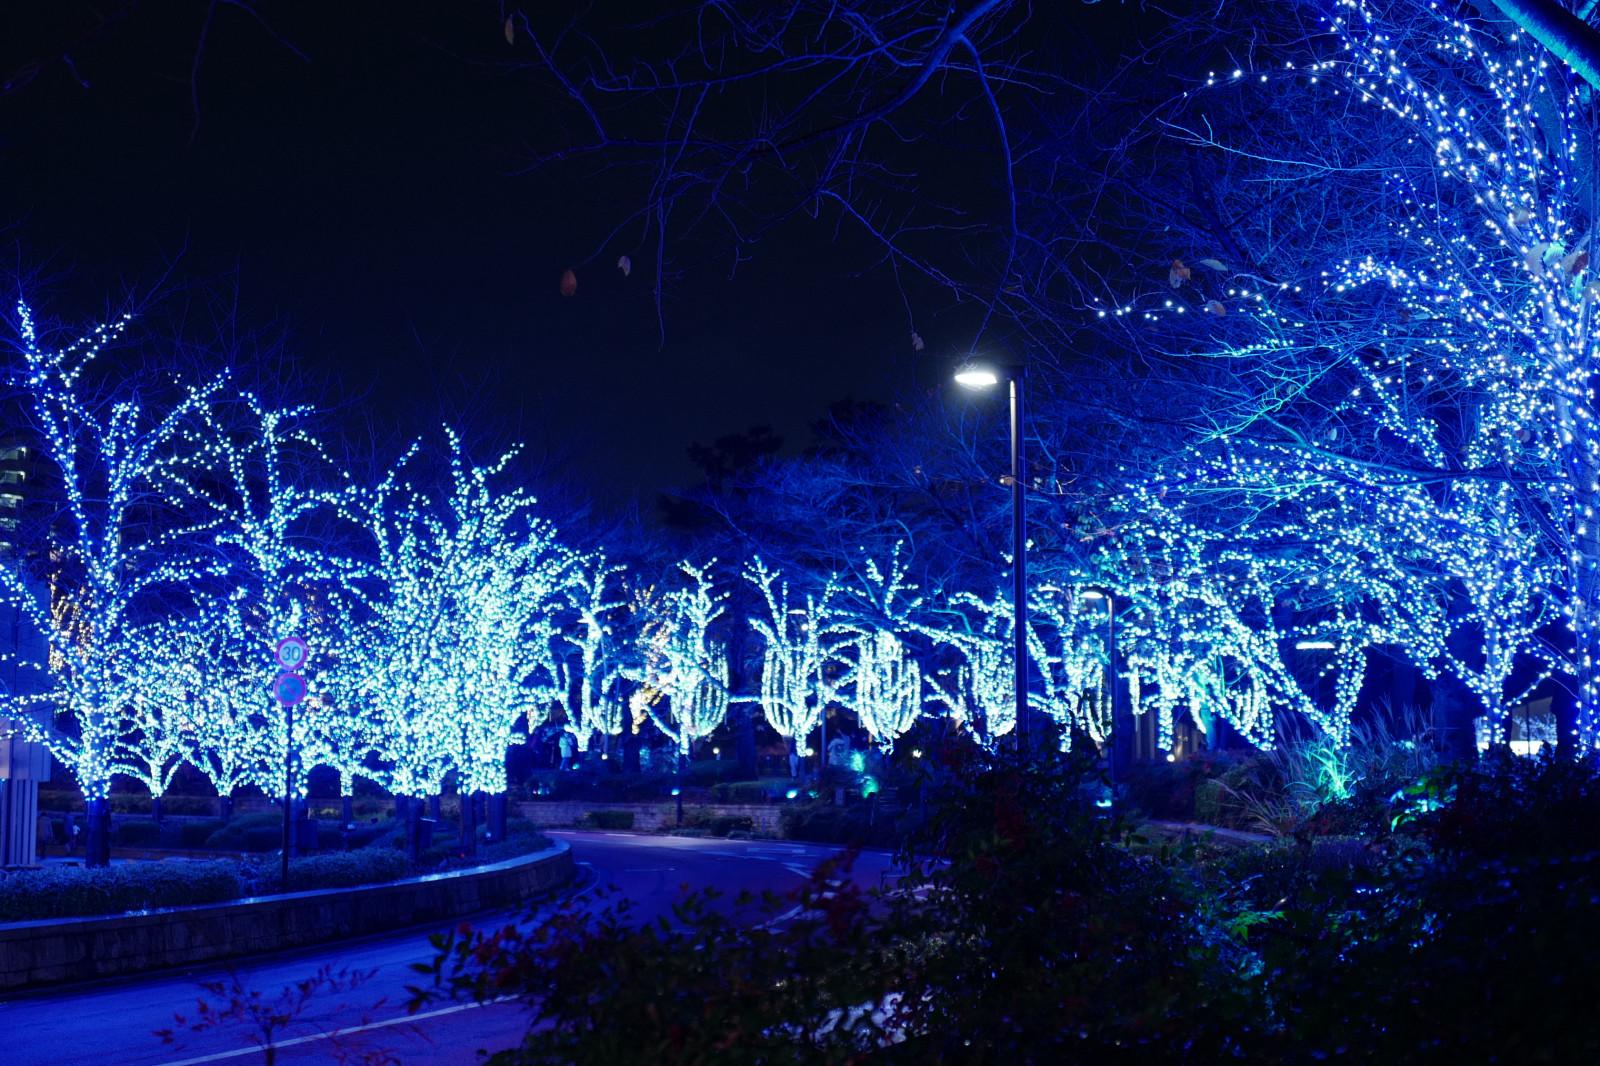 Fondos de pantalla  Japn noche luces de Navidad Leica